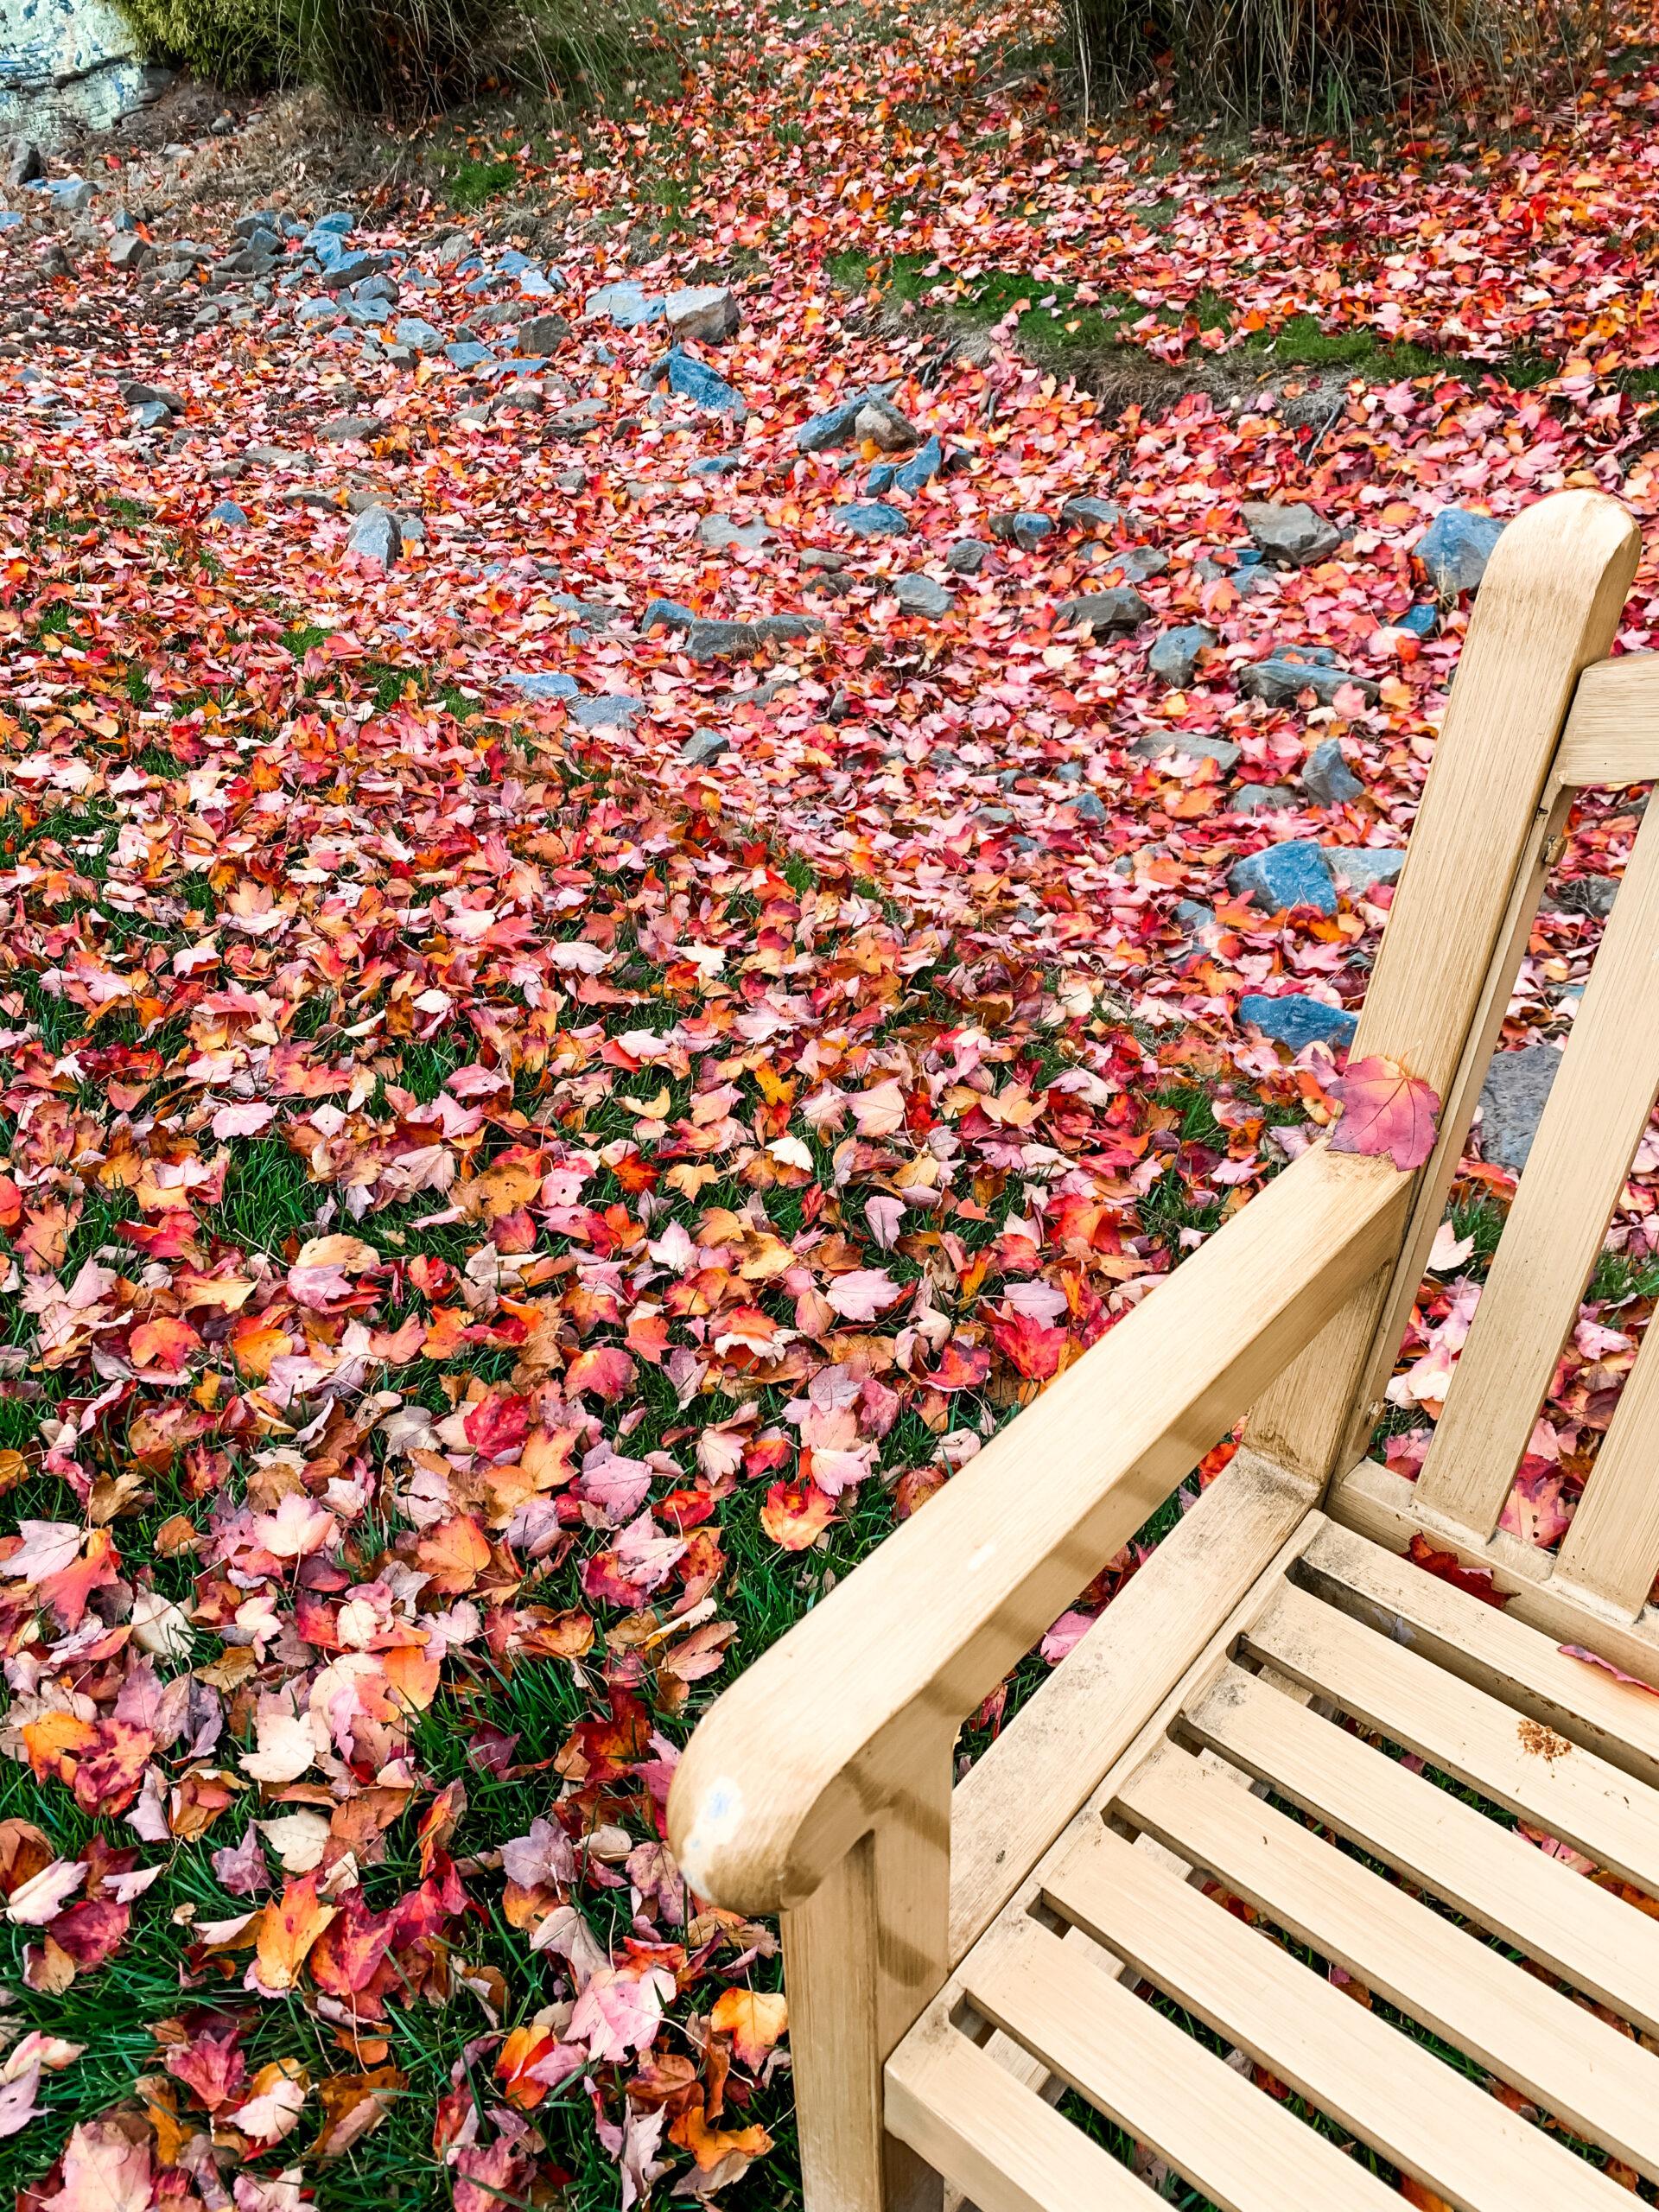 THE WOODLOCH RESORT - Resort Review + Trip Recap on Coming Up Roses